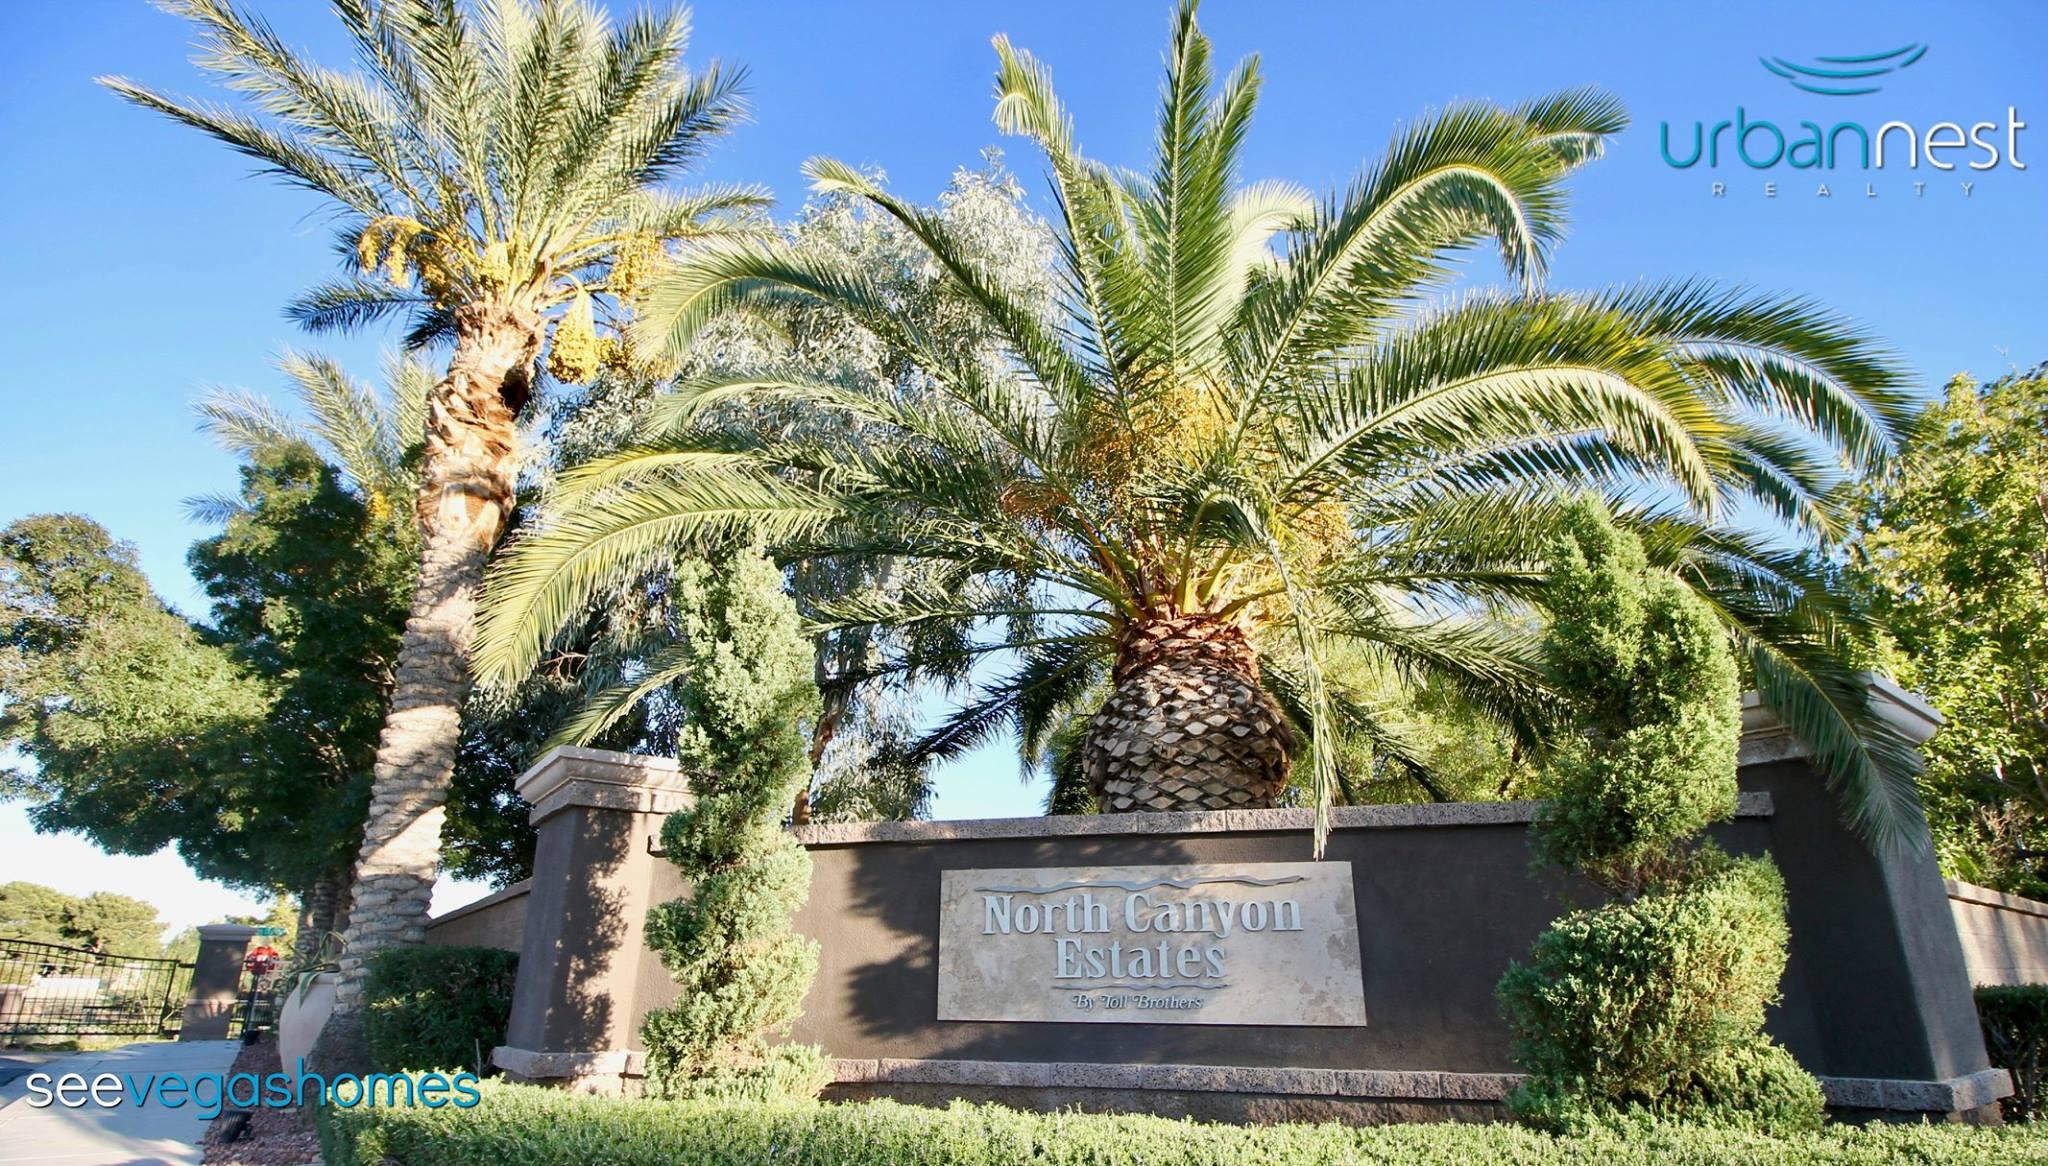 North Canyon Estates Toll Brothers Las Vegas NV 89149 SeeVegasHomes